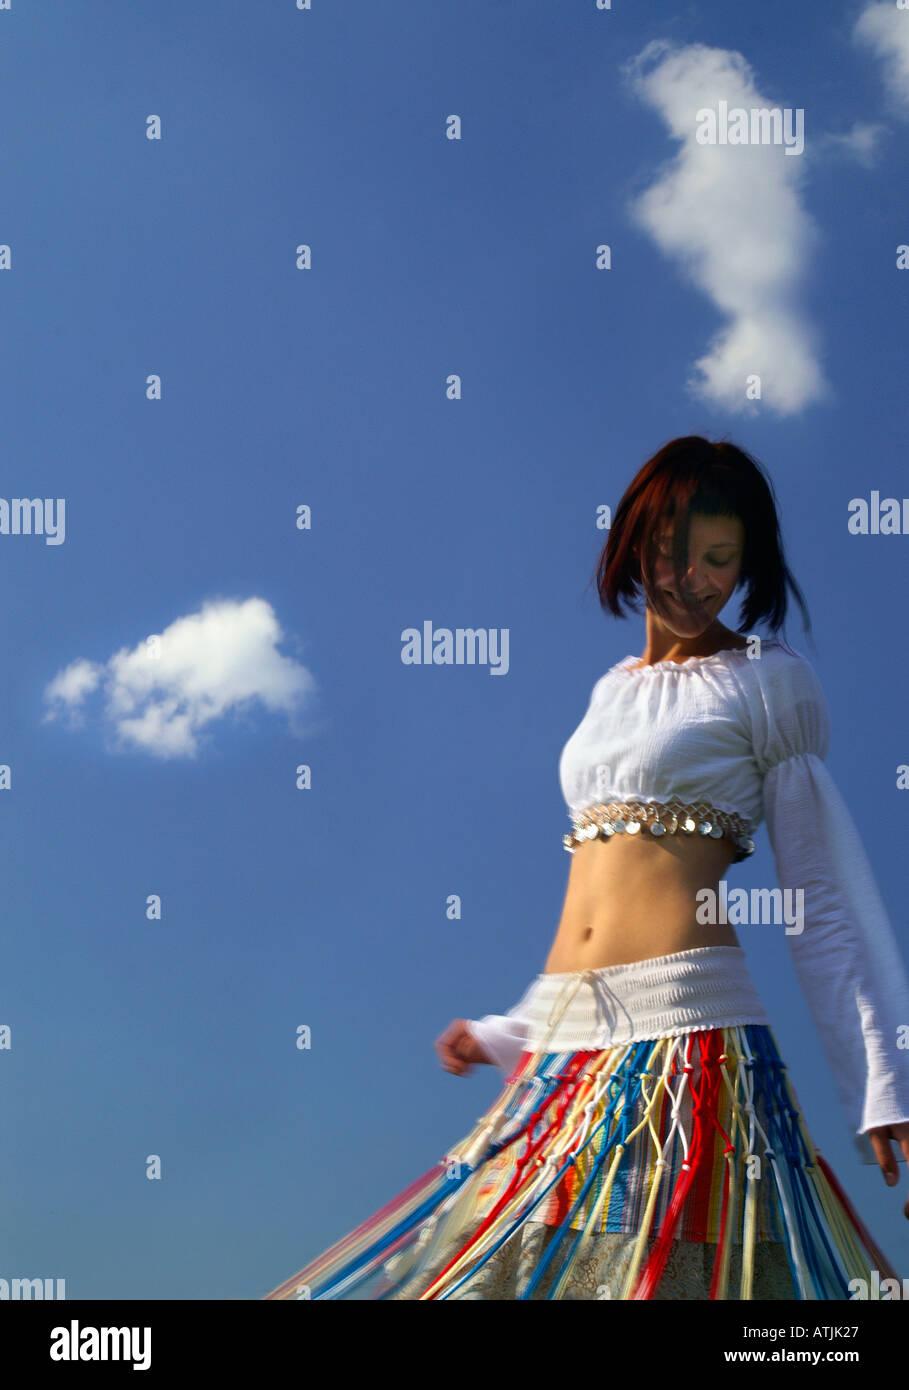 d9db6e1925991 Pretty beautiful slender Girl, Teenage bare Belly Dancer, dancing outdoors  under blue sky